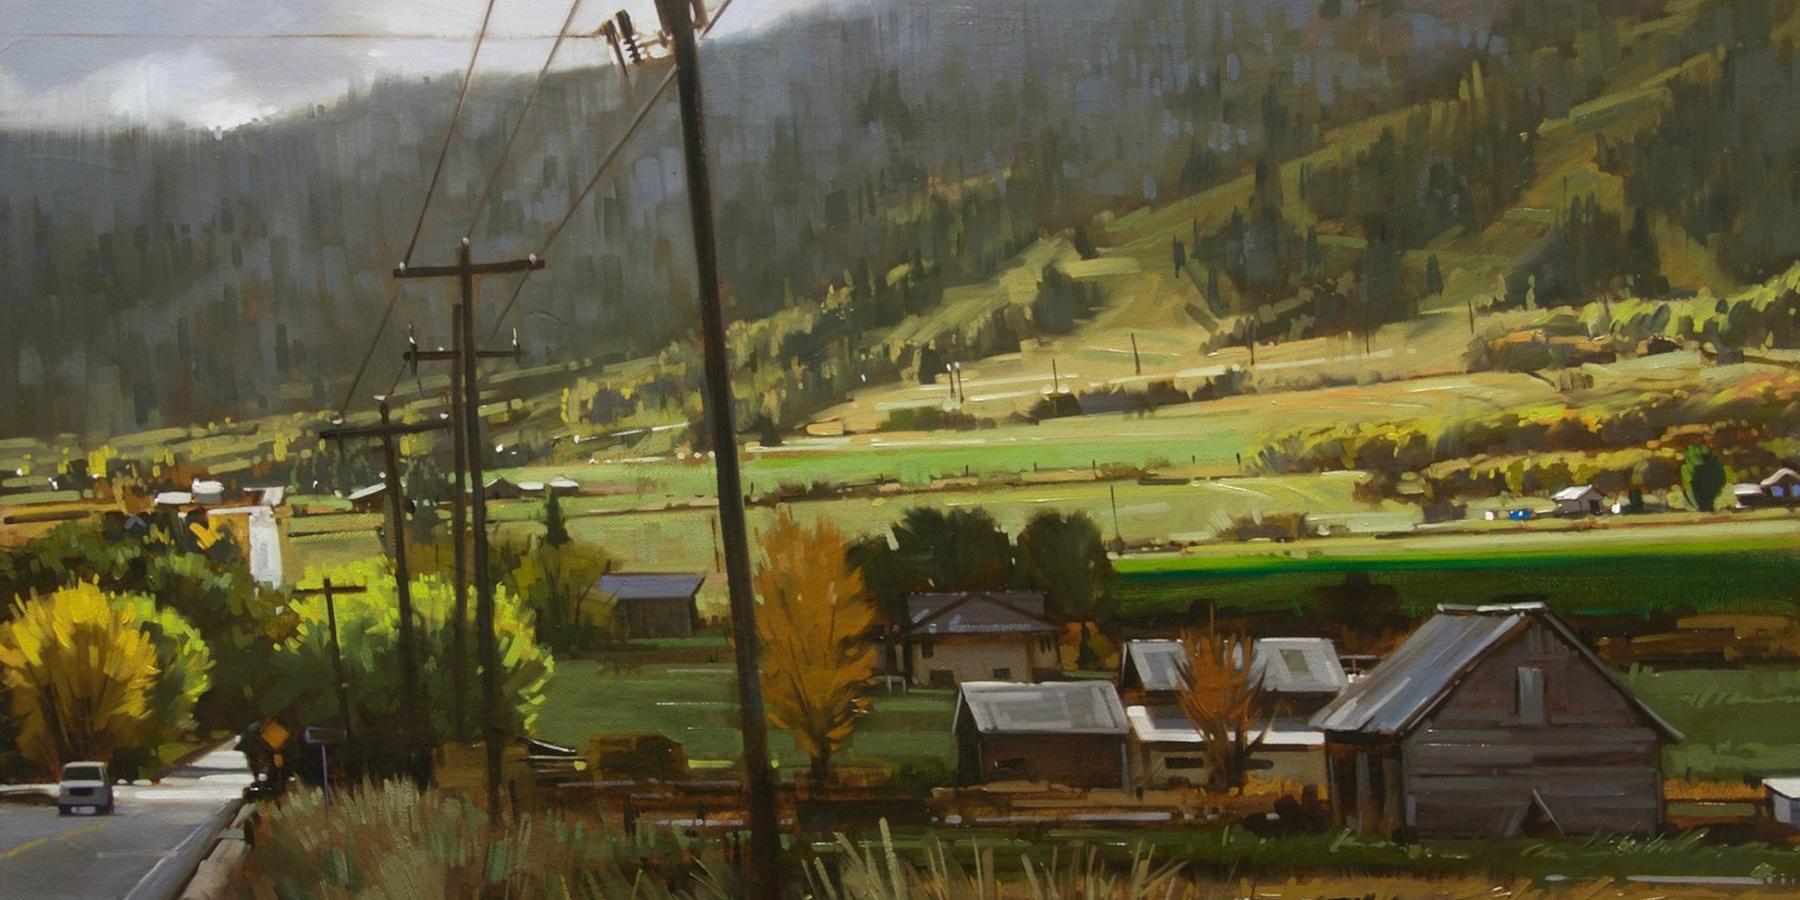 The Paintings of Doug Braithwaite